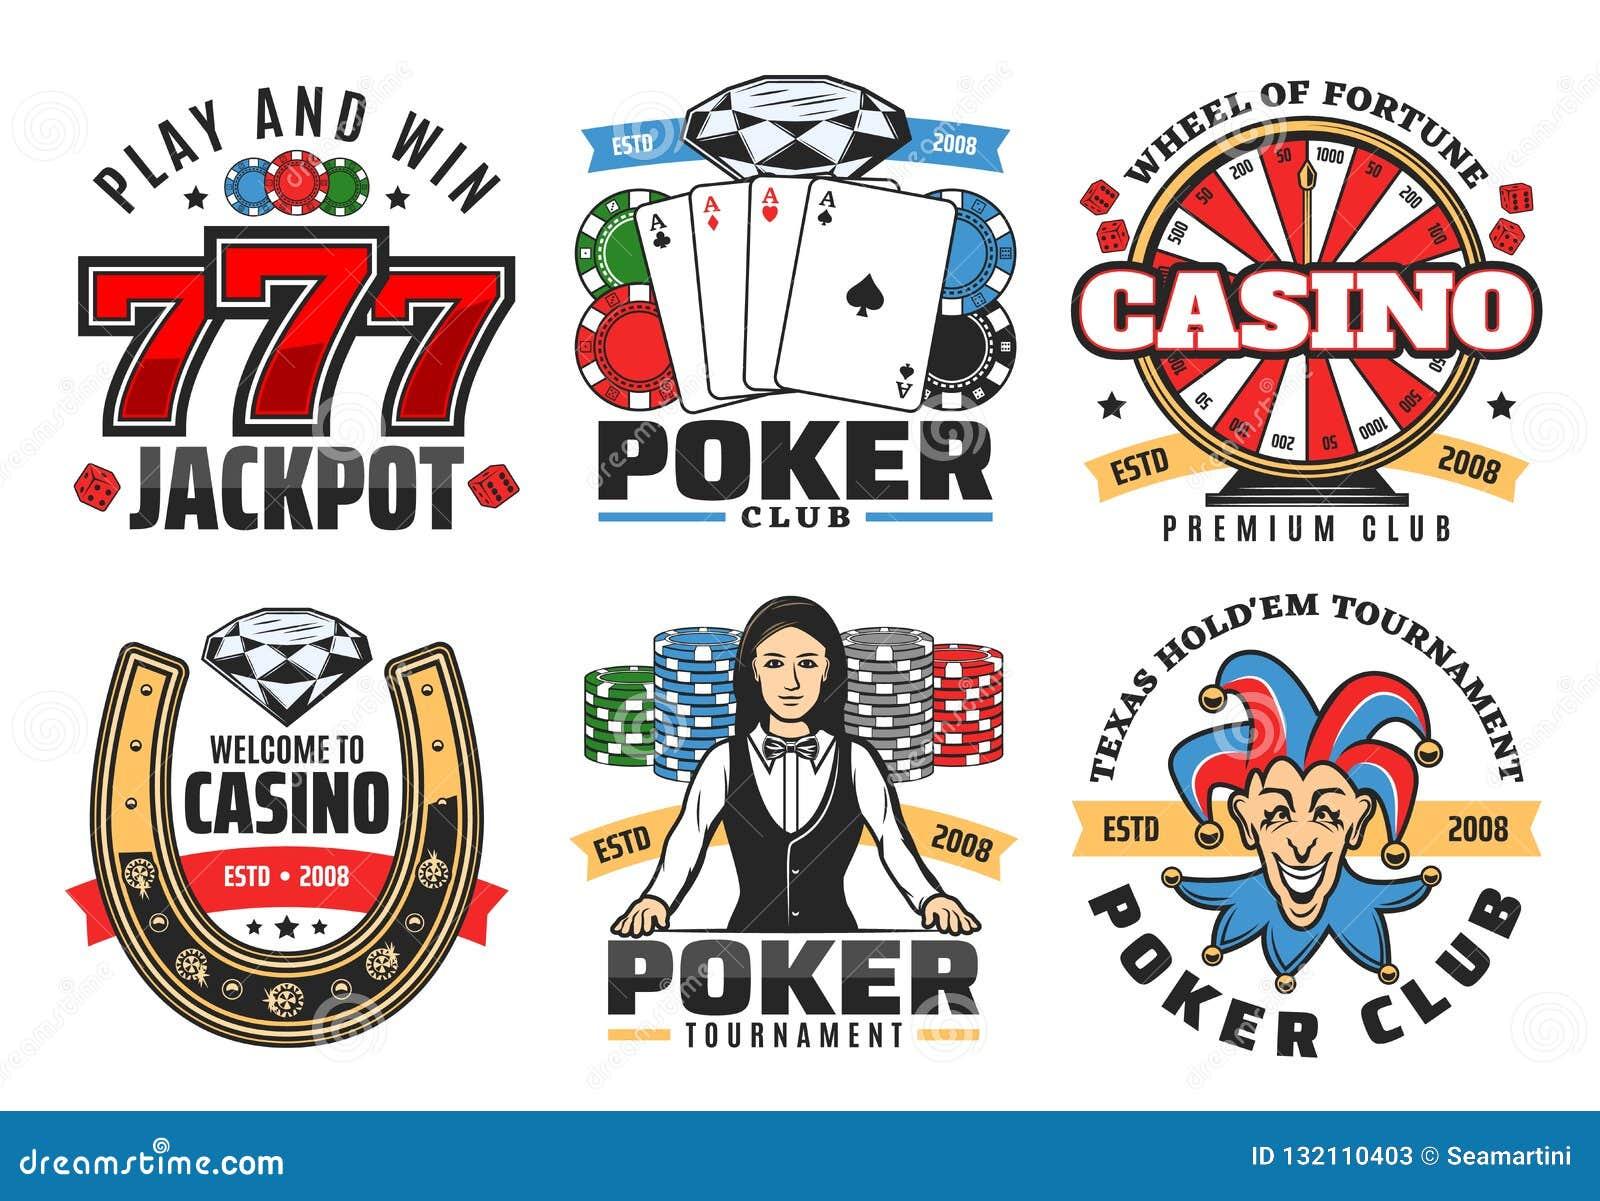 Casino Poker Game Jackpot Gambling Vector Icons Stock Vector Illustration Of Bingo Game 132110403